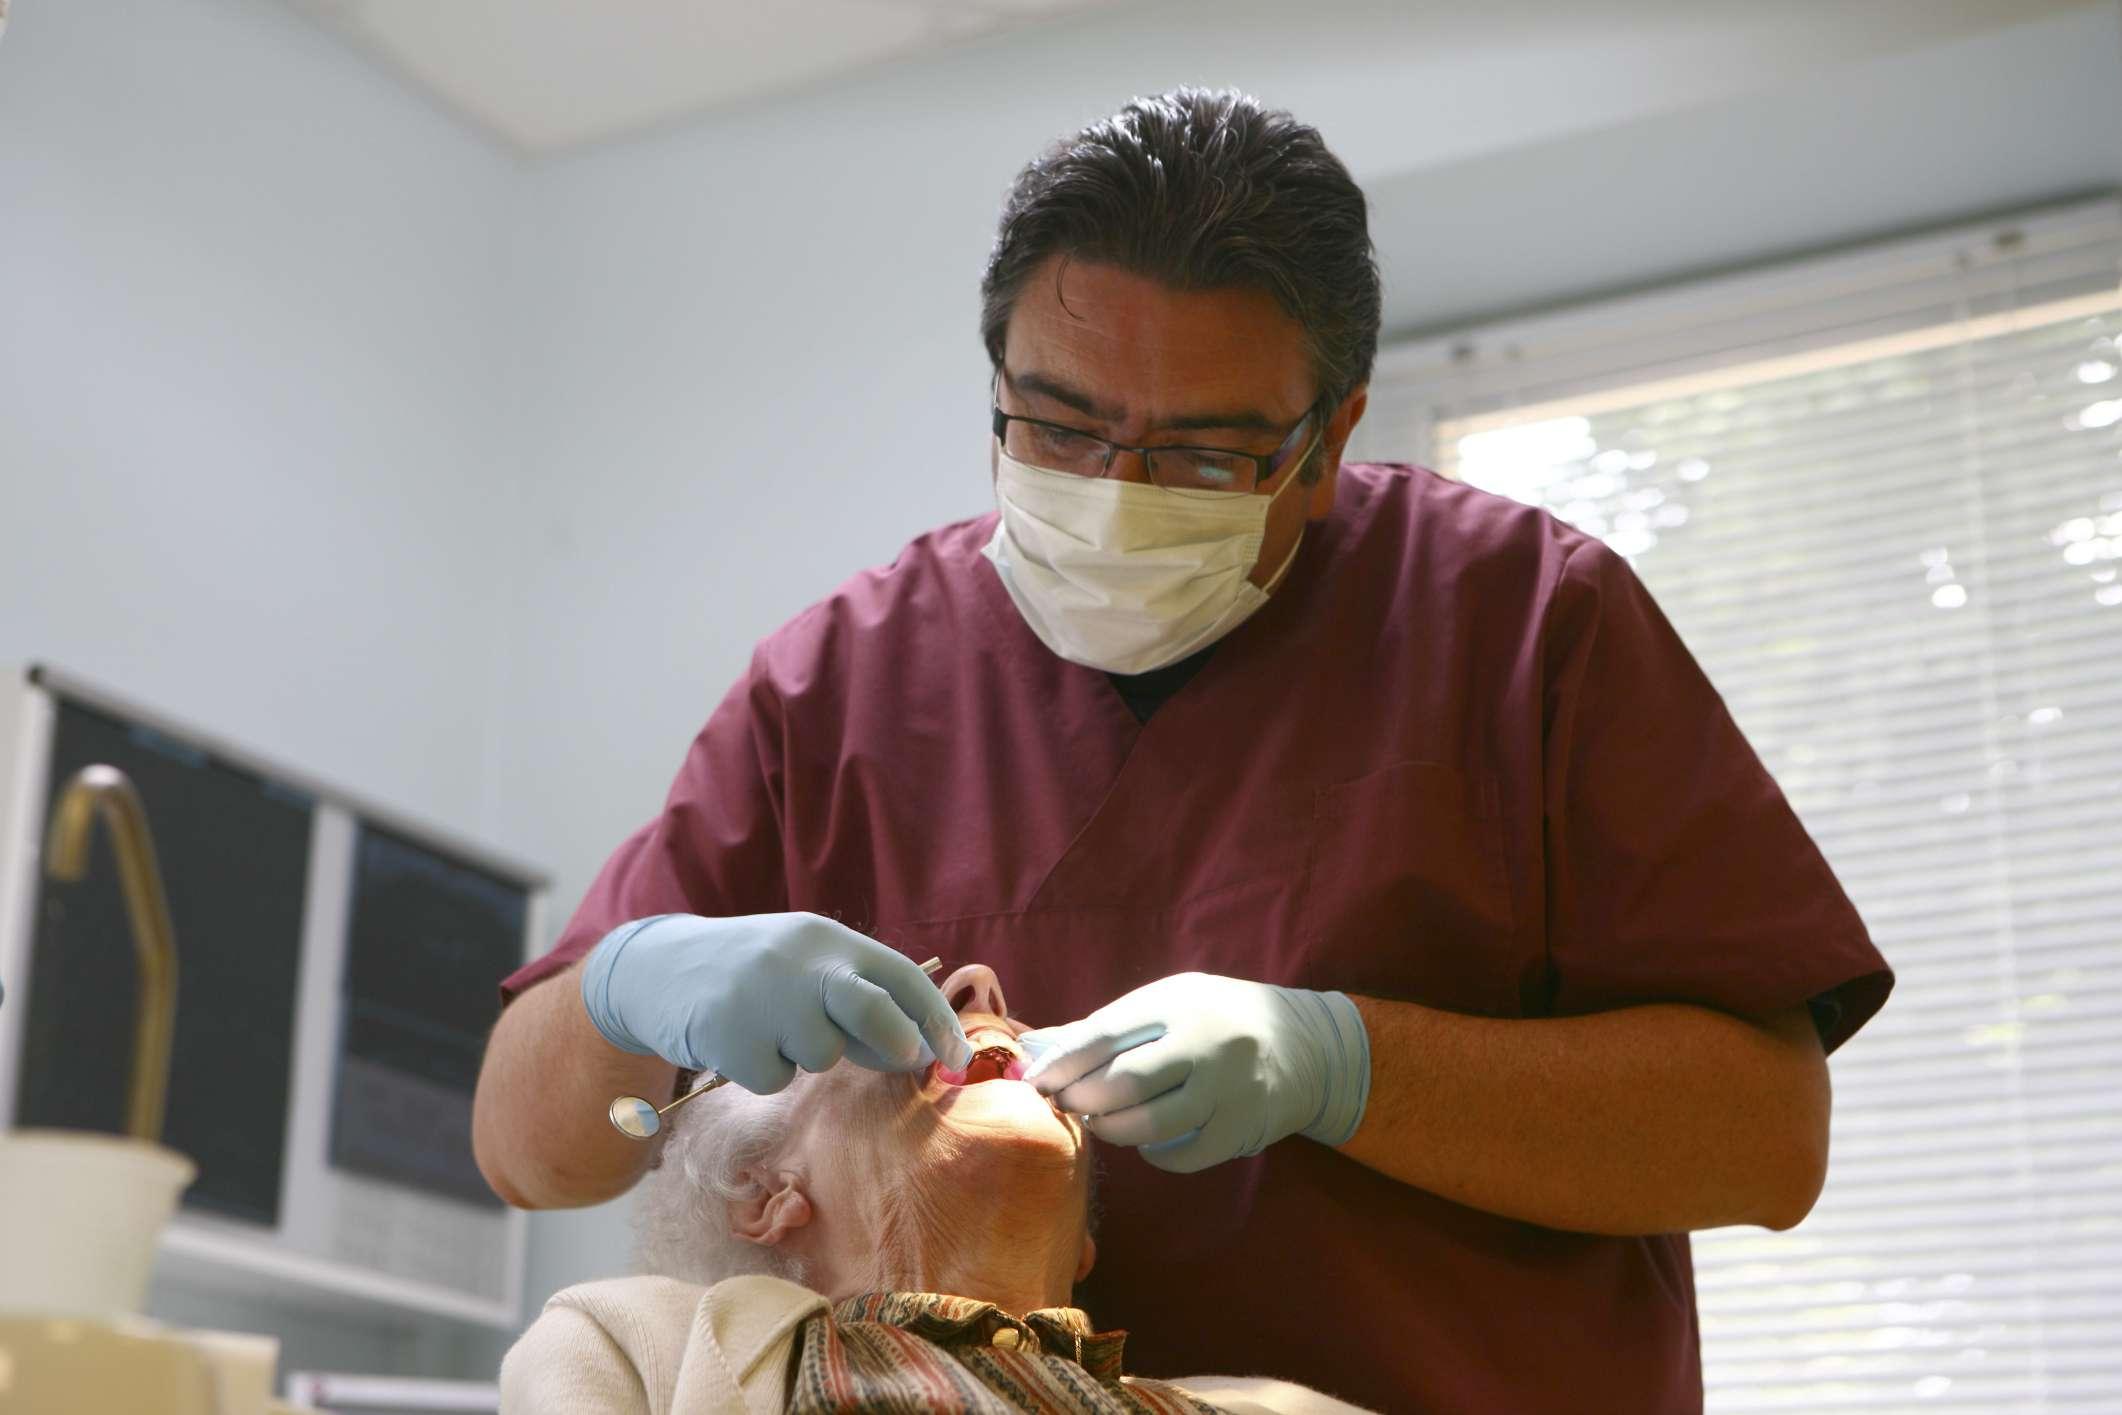 Dentist working on older woman